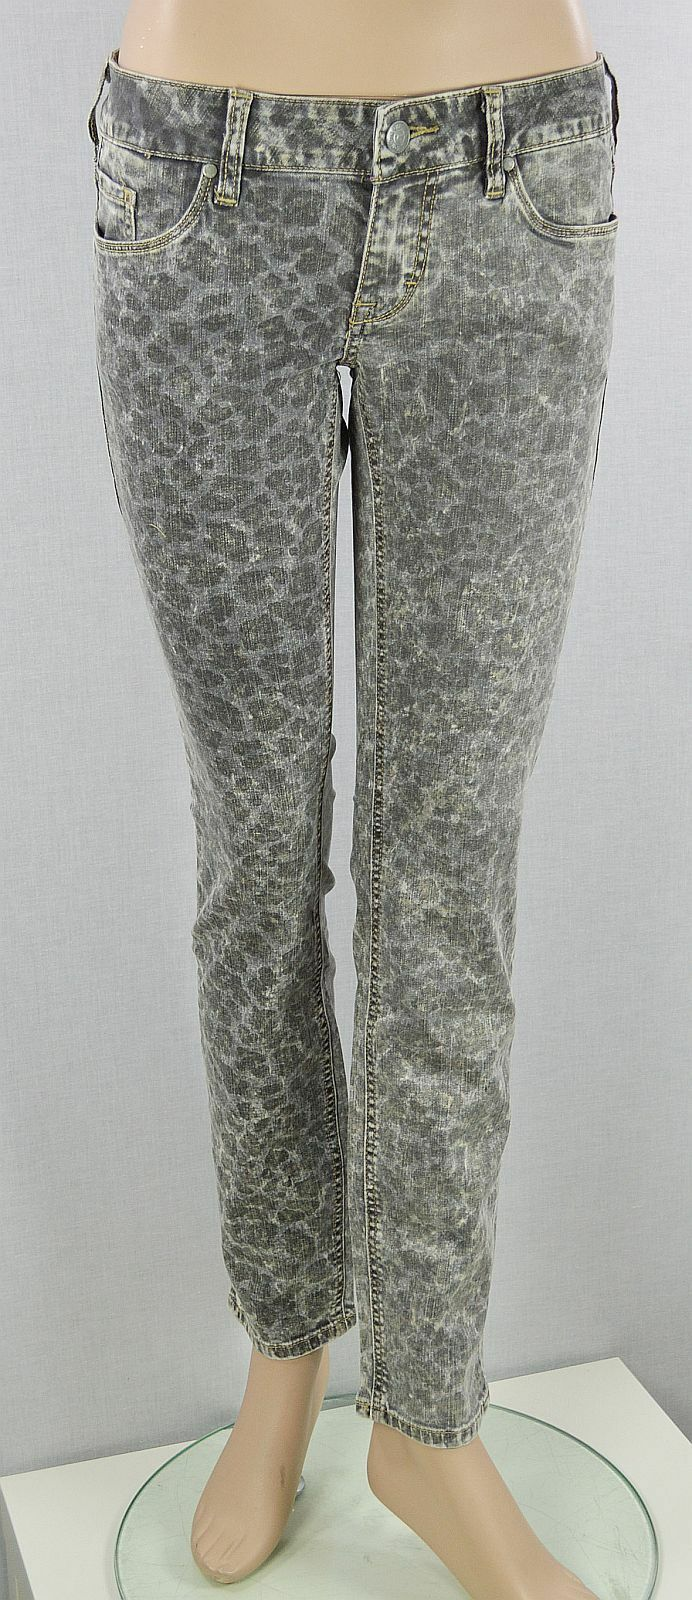 f70c59ae276848 Mustang Gina Gina Gina Skinny Slim Fit Damen Stretch Jeans hose damenjeans  hosen 1-1224 504441